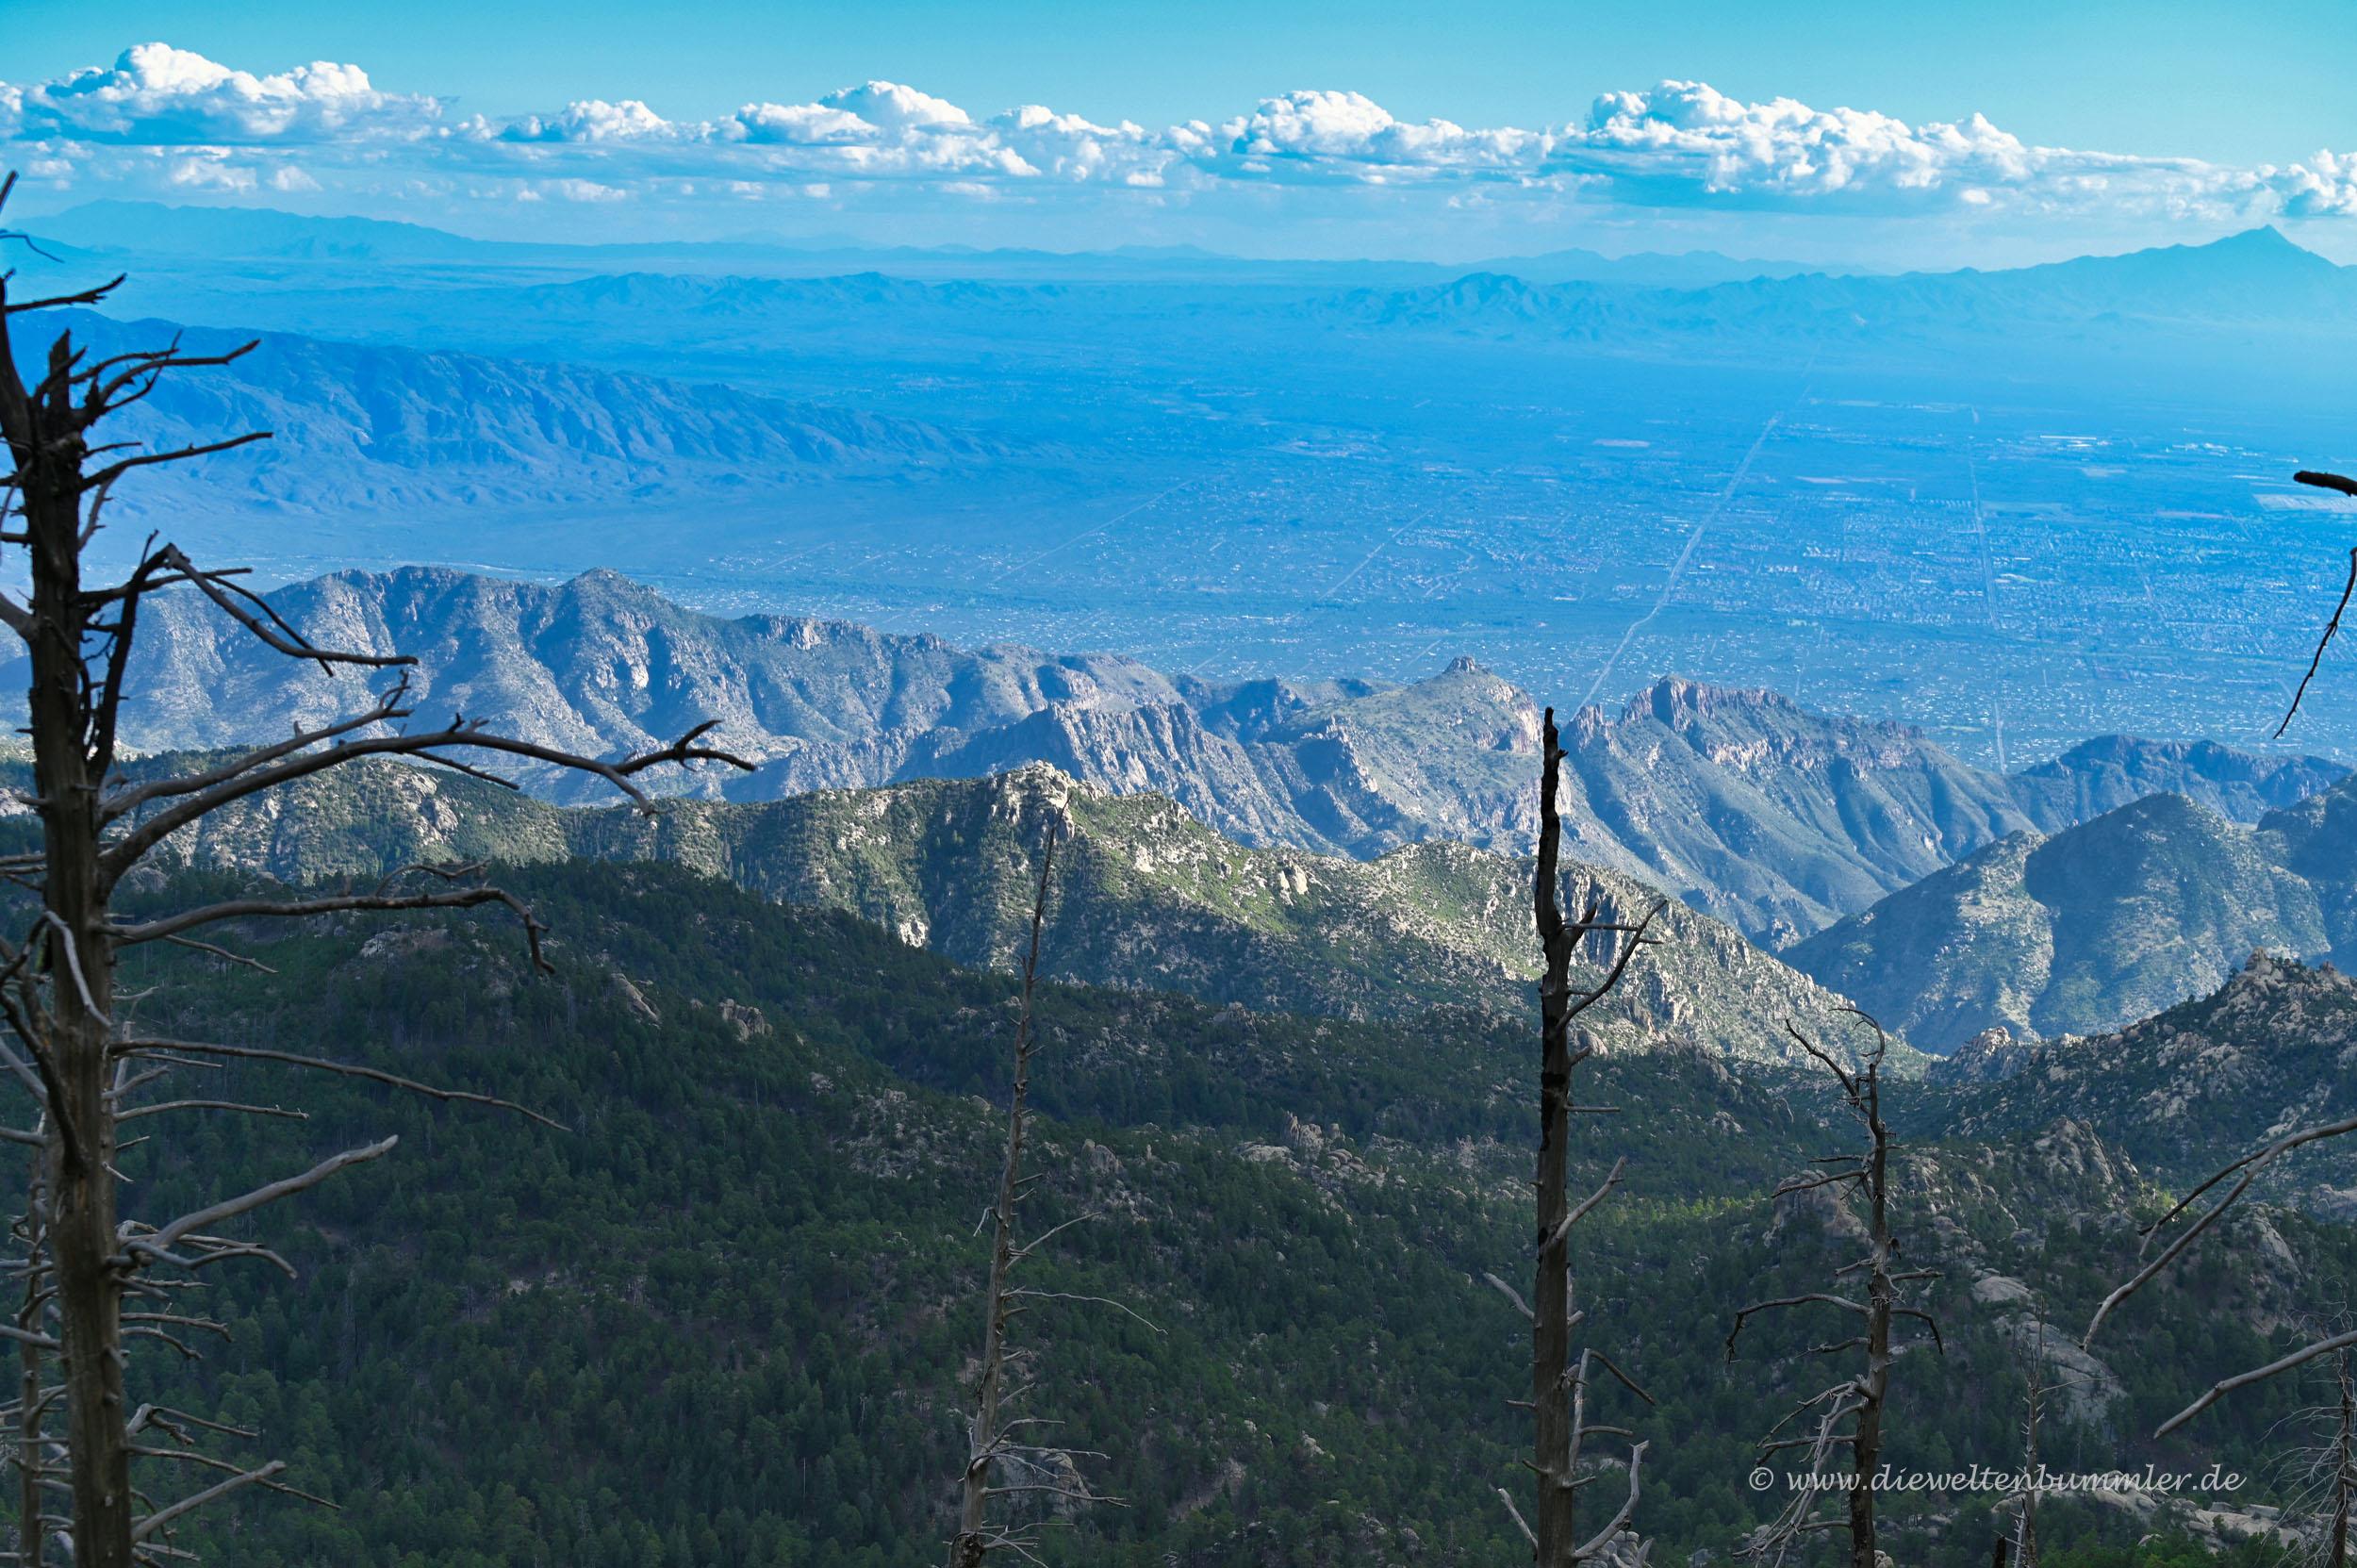 Ausblick vom Mount Lemmon